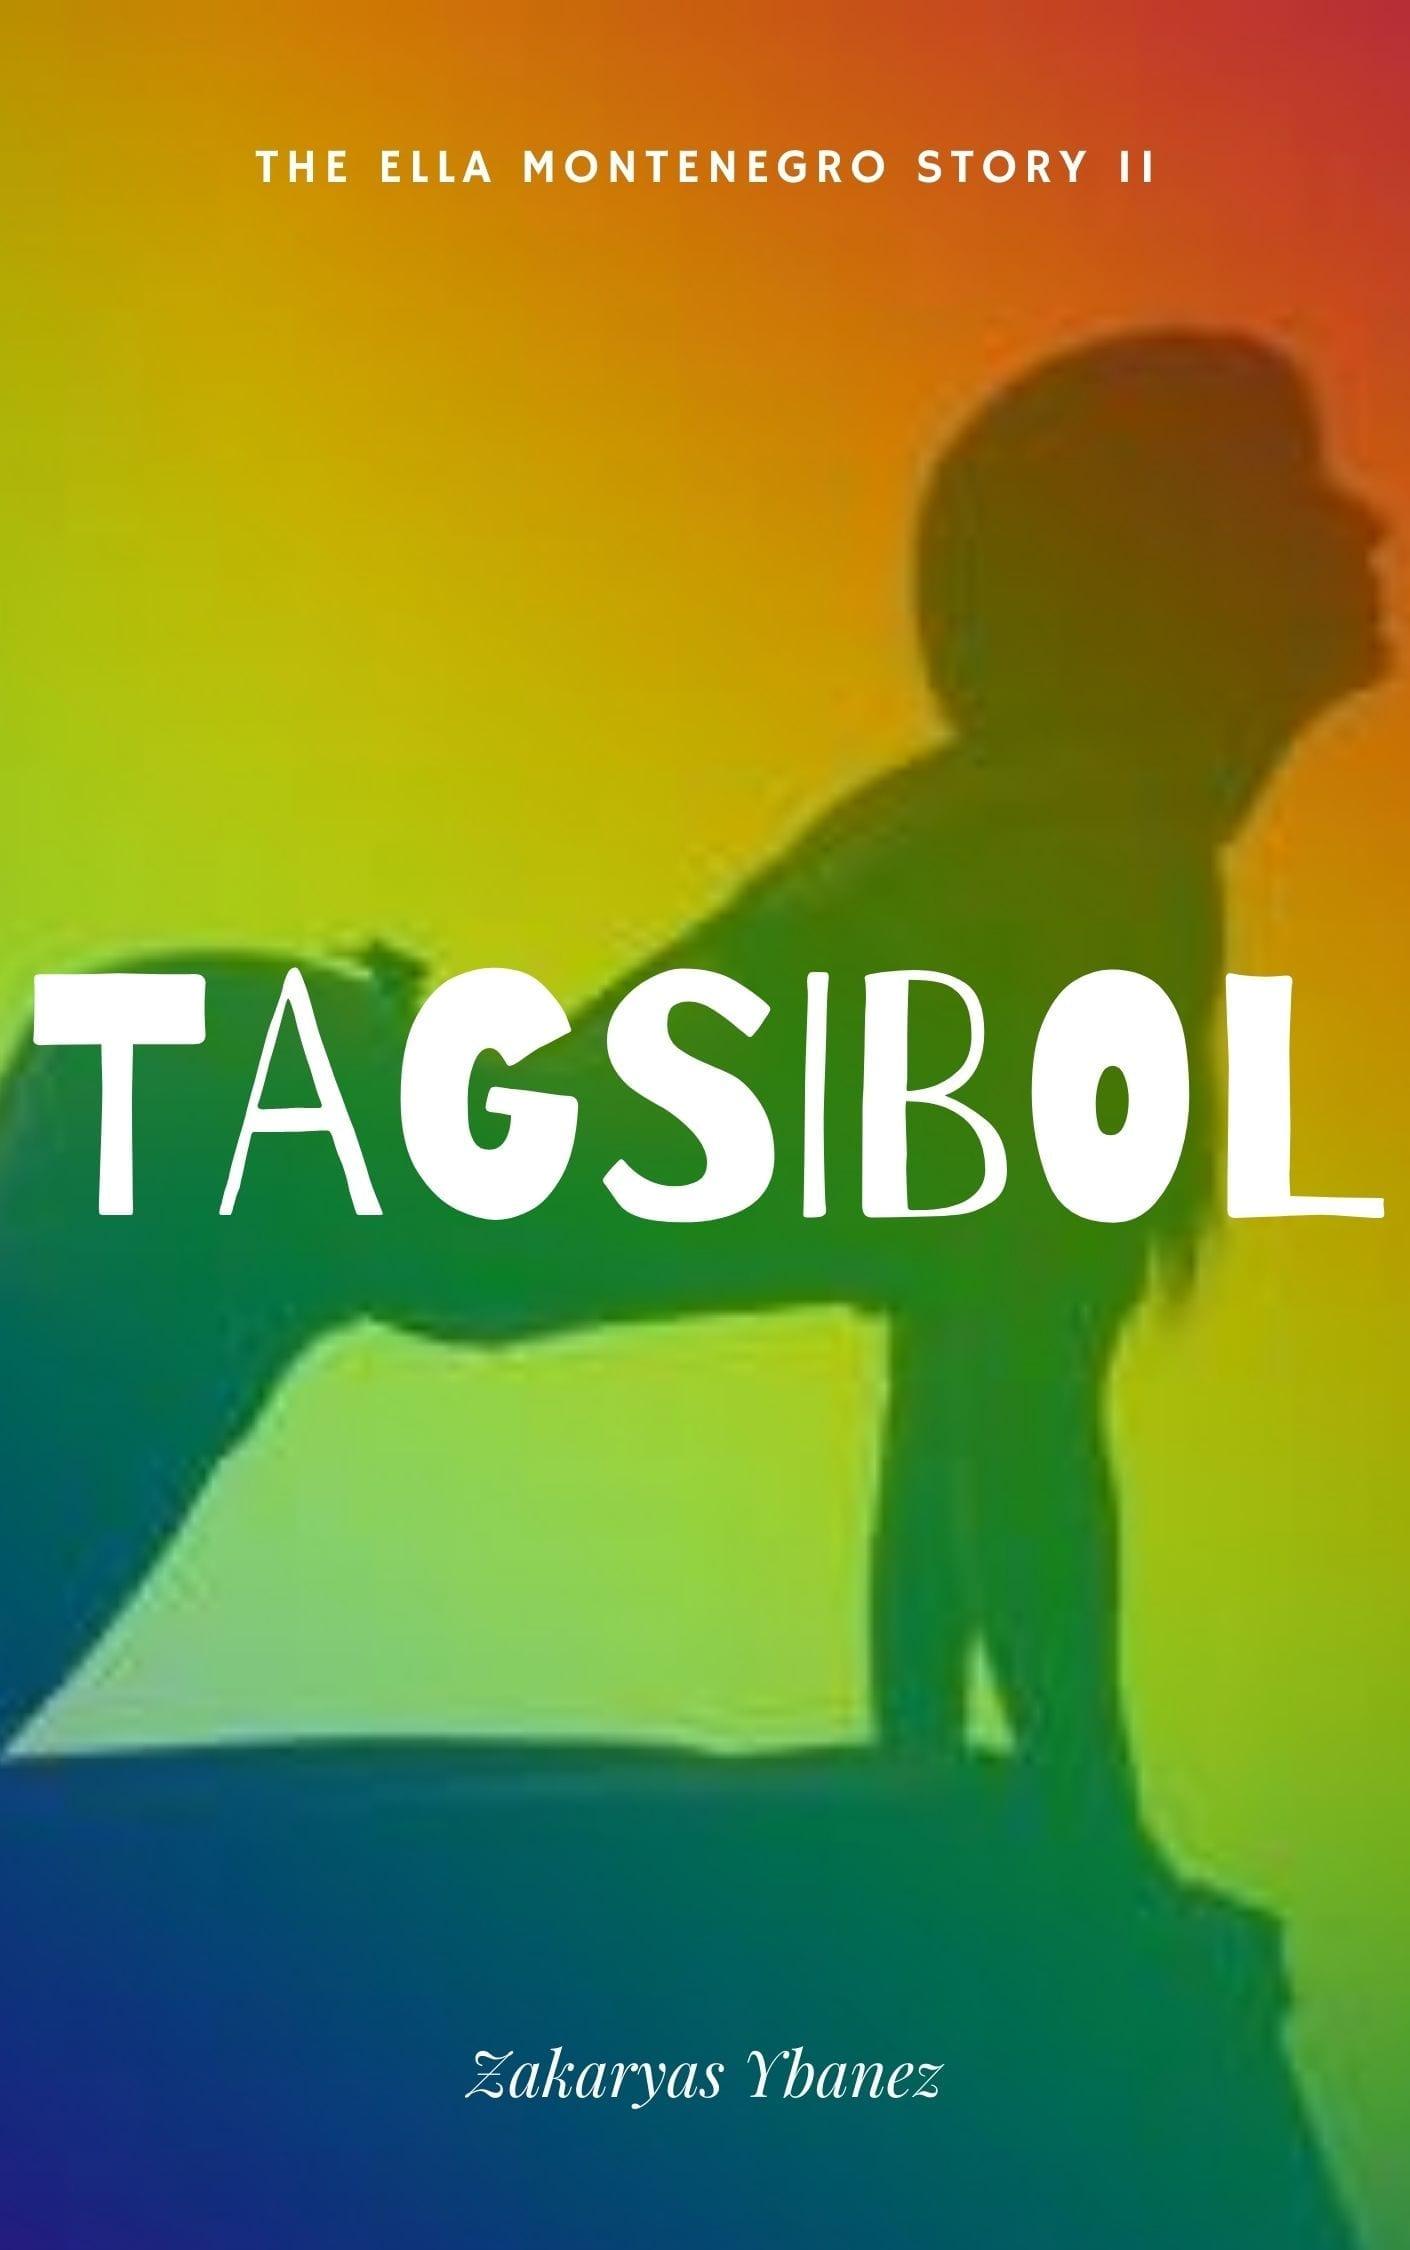 TAGSIBOL